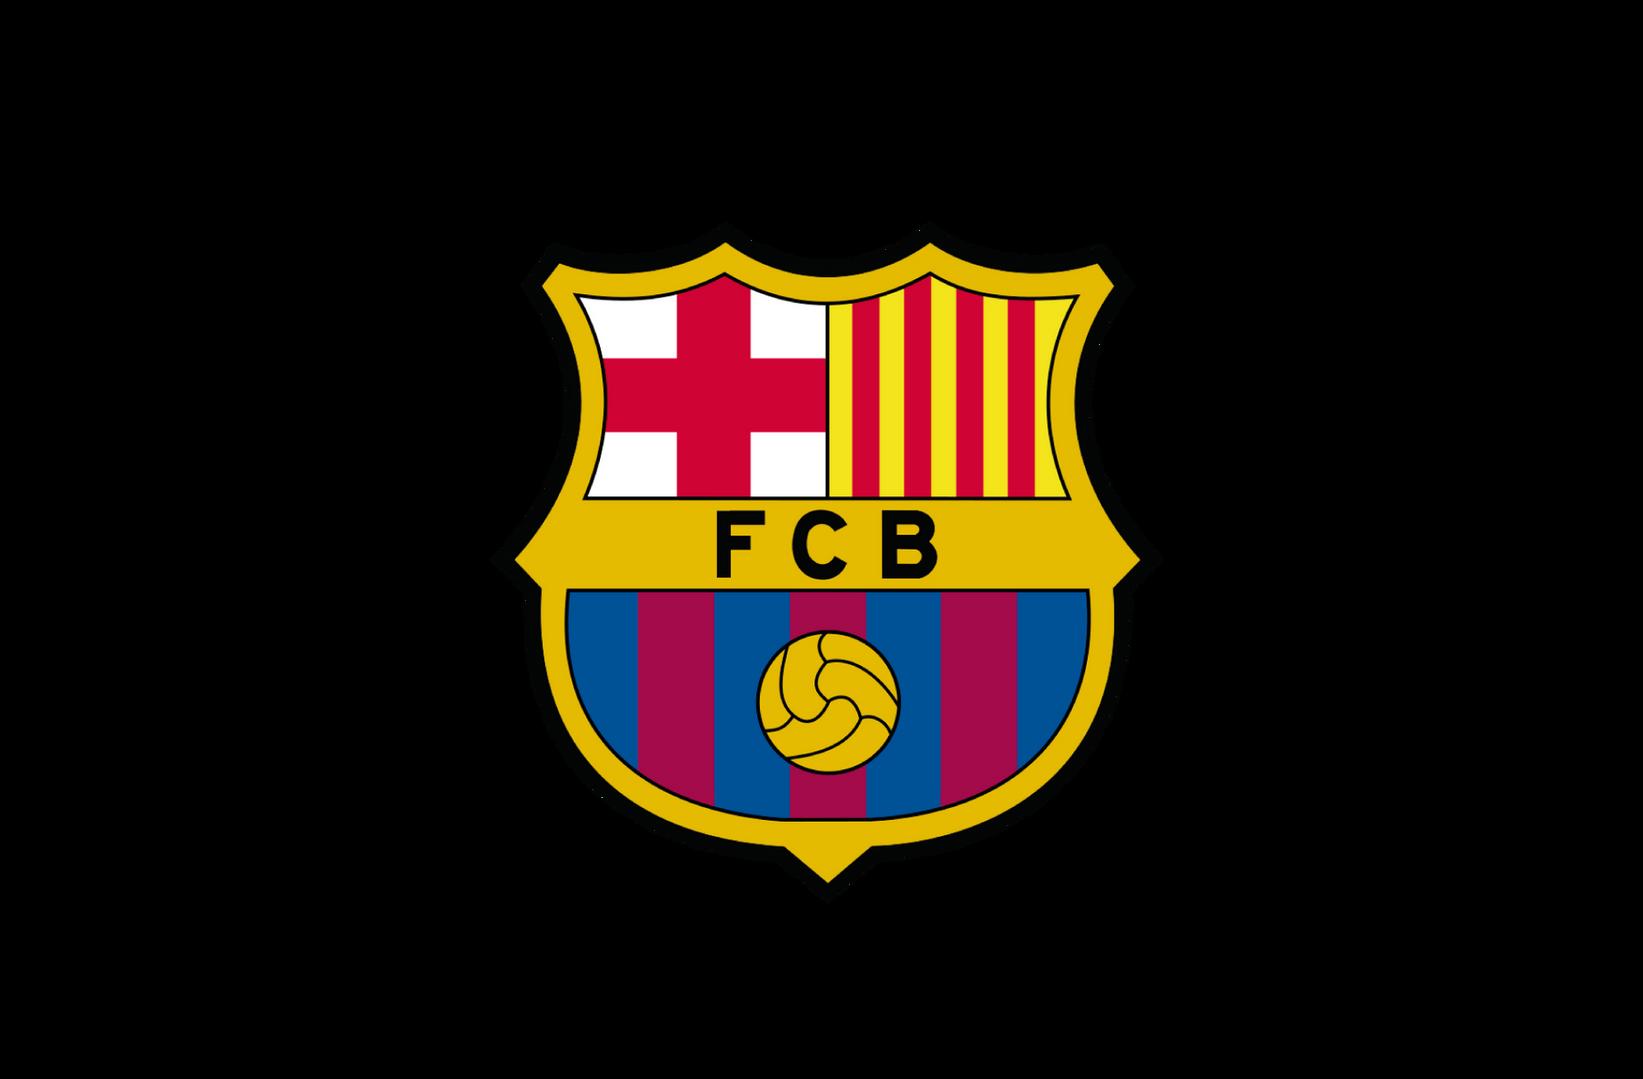 LOGO-FC-BARCELONA.png